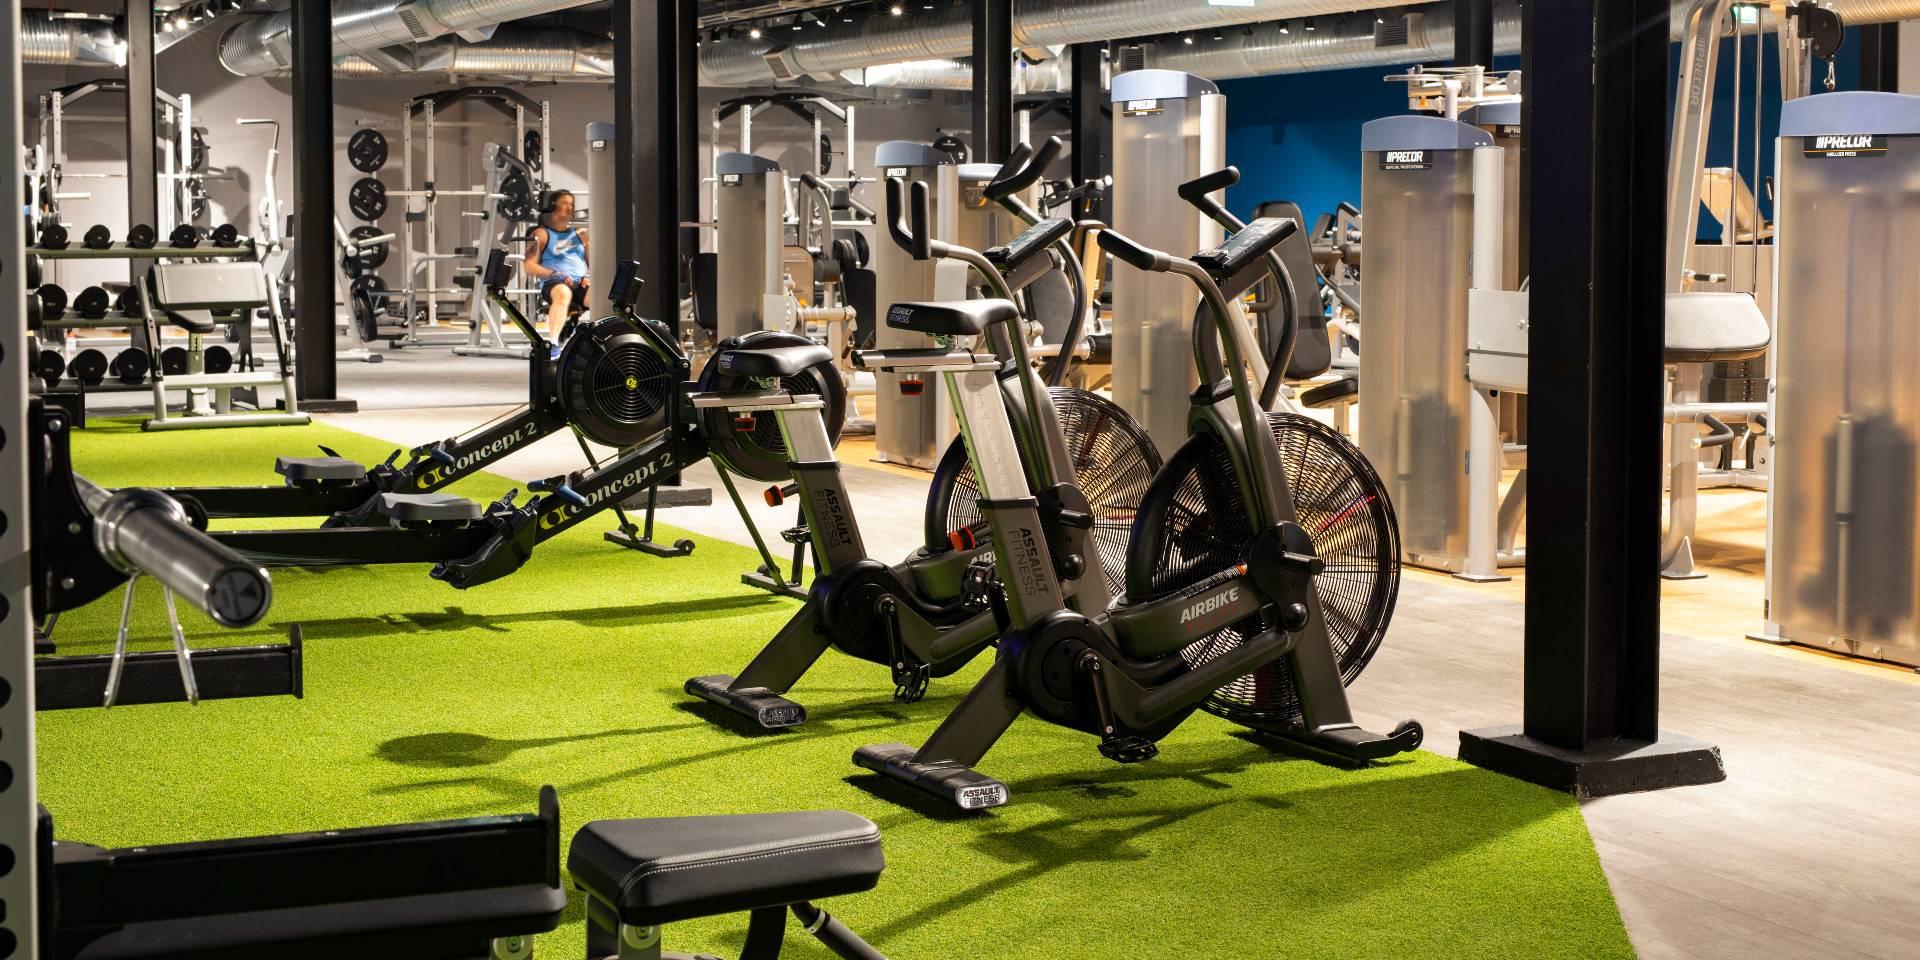 Gym-Equipment 2